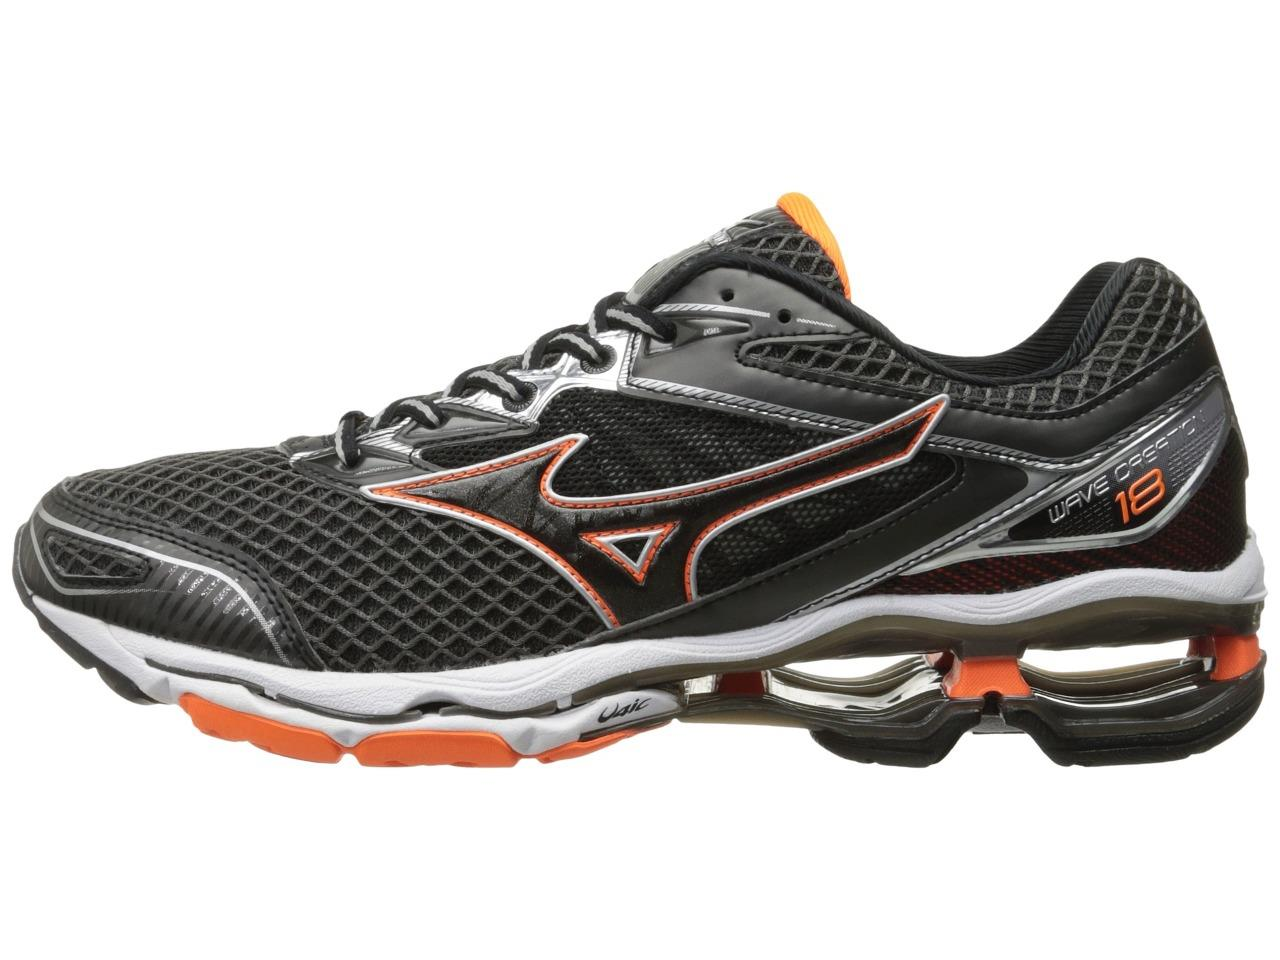 mens mizuno running shoes size 9.5 eu west side city